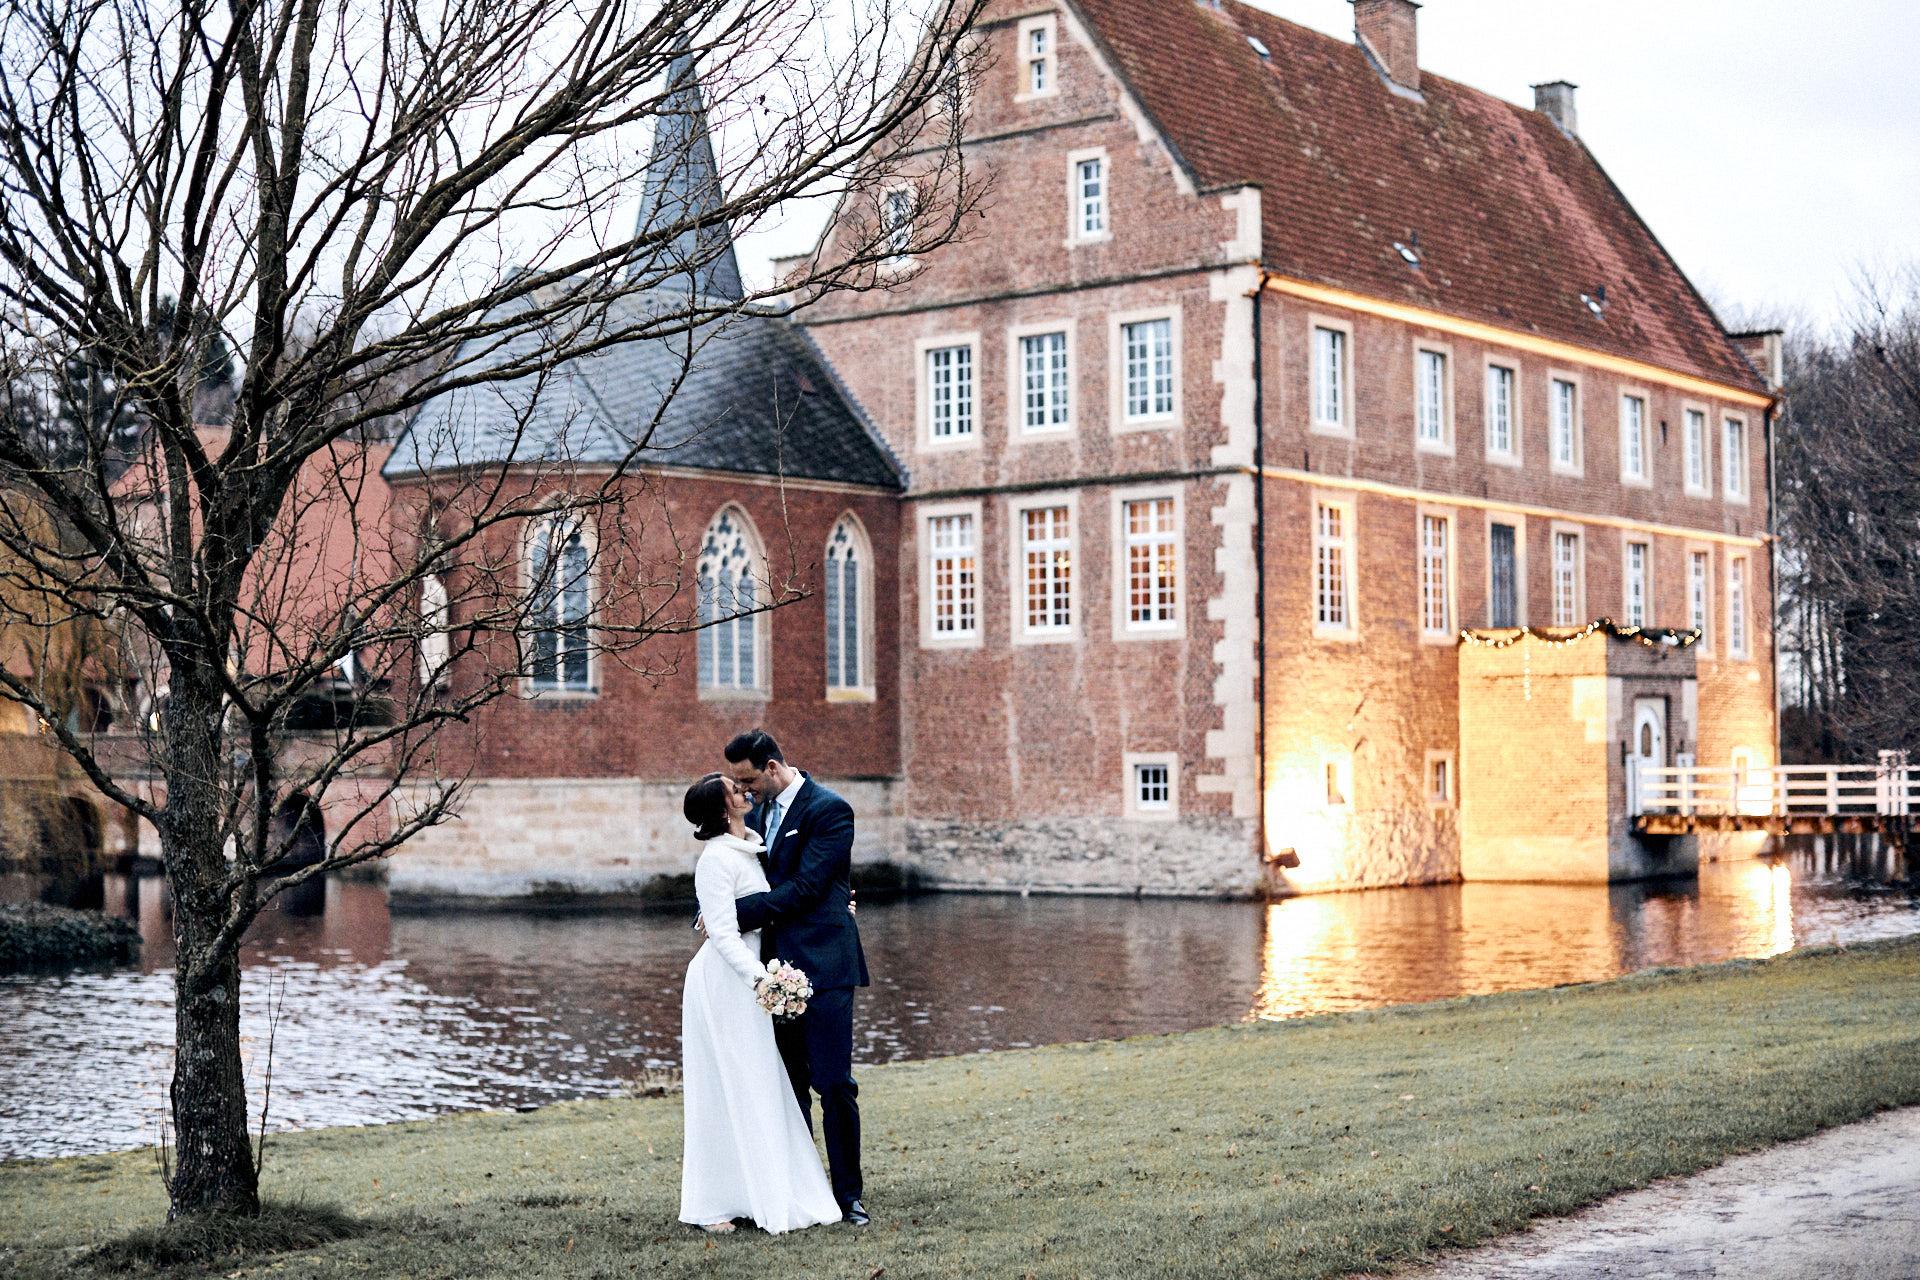 2019-12-20 Laura & Robin - Alena and Daniel Weddings 0587